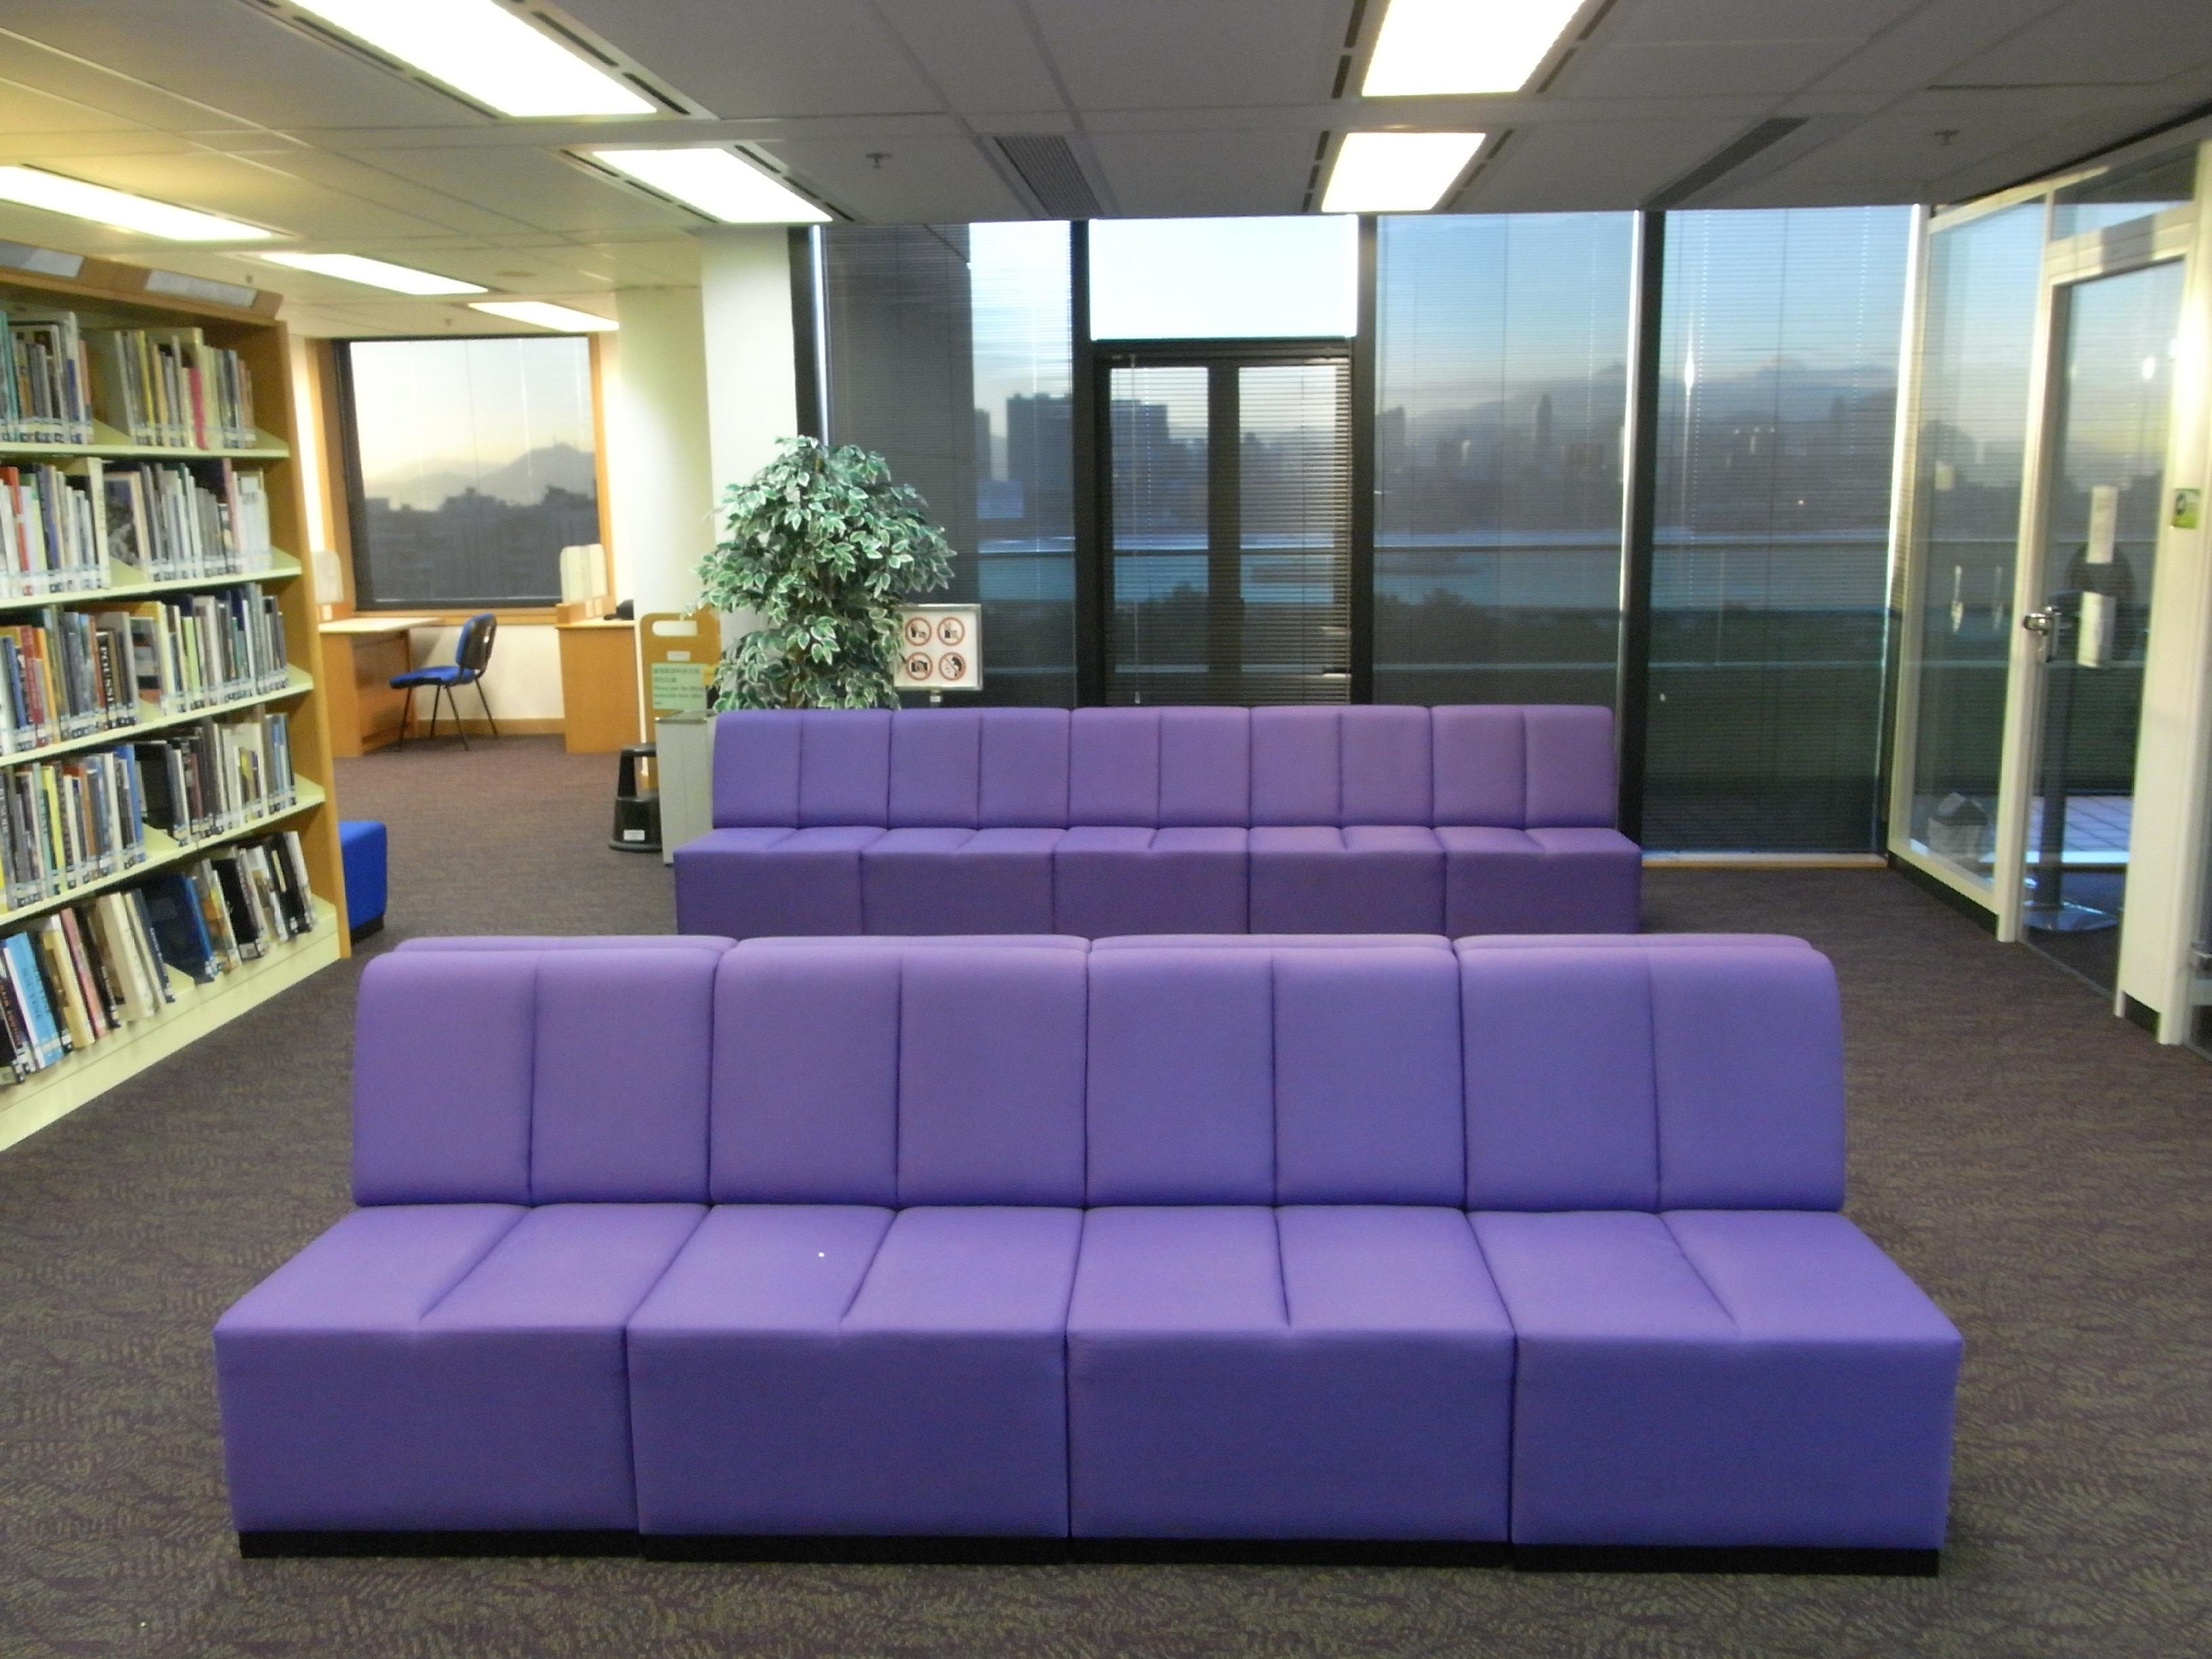 Elegant File:HK 香港中央圖書館 Central Library 10th Floor Interior Lobby Sofa In Purple